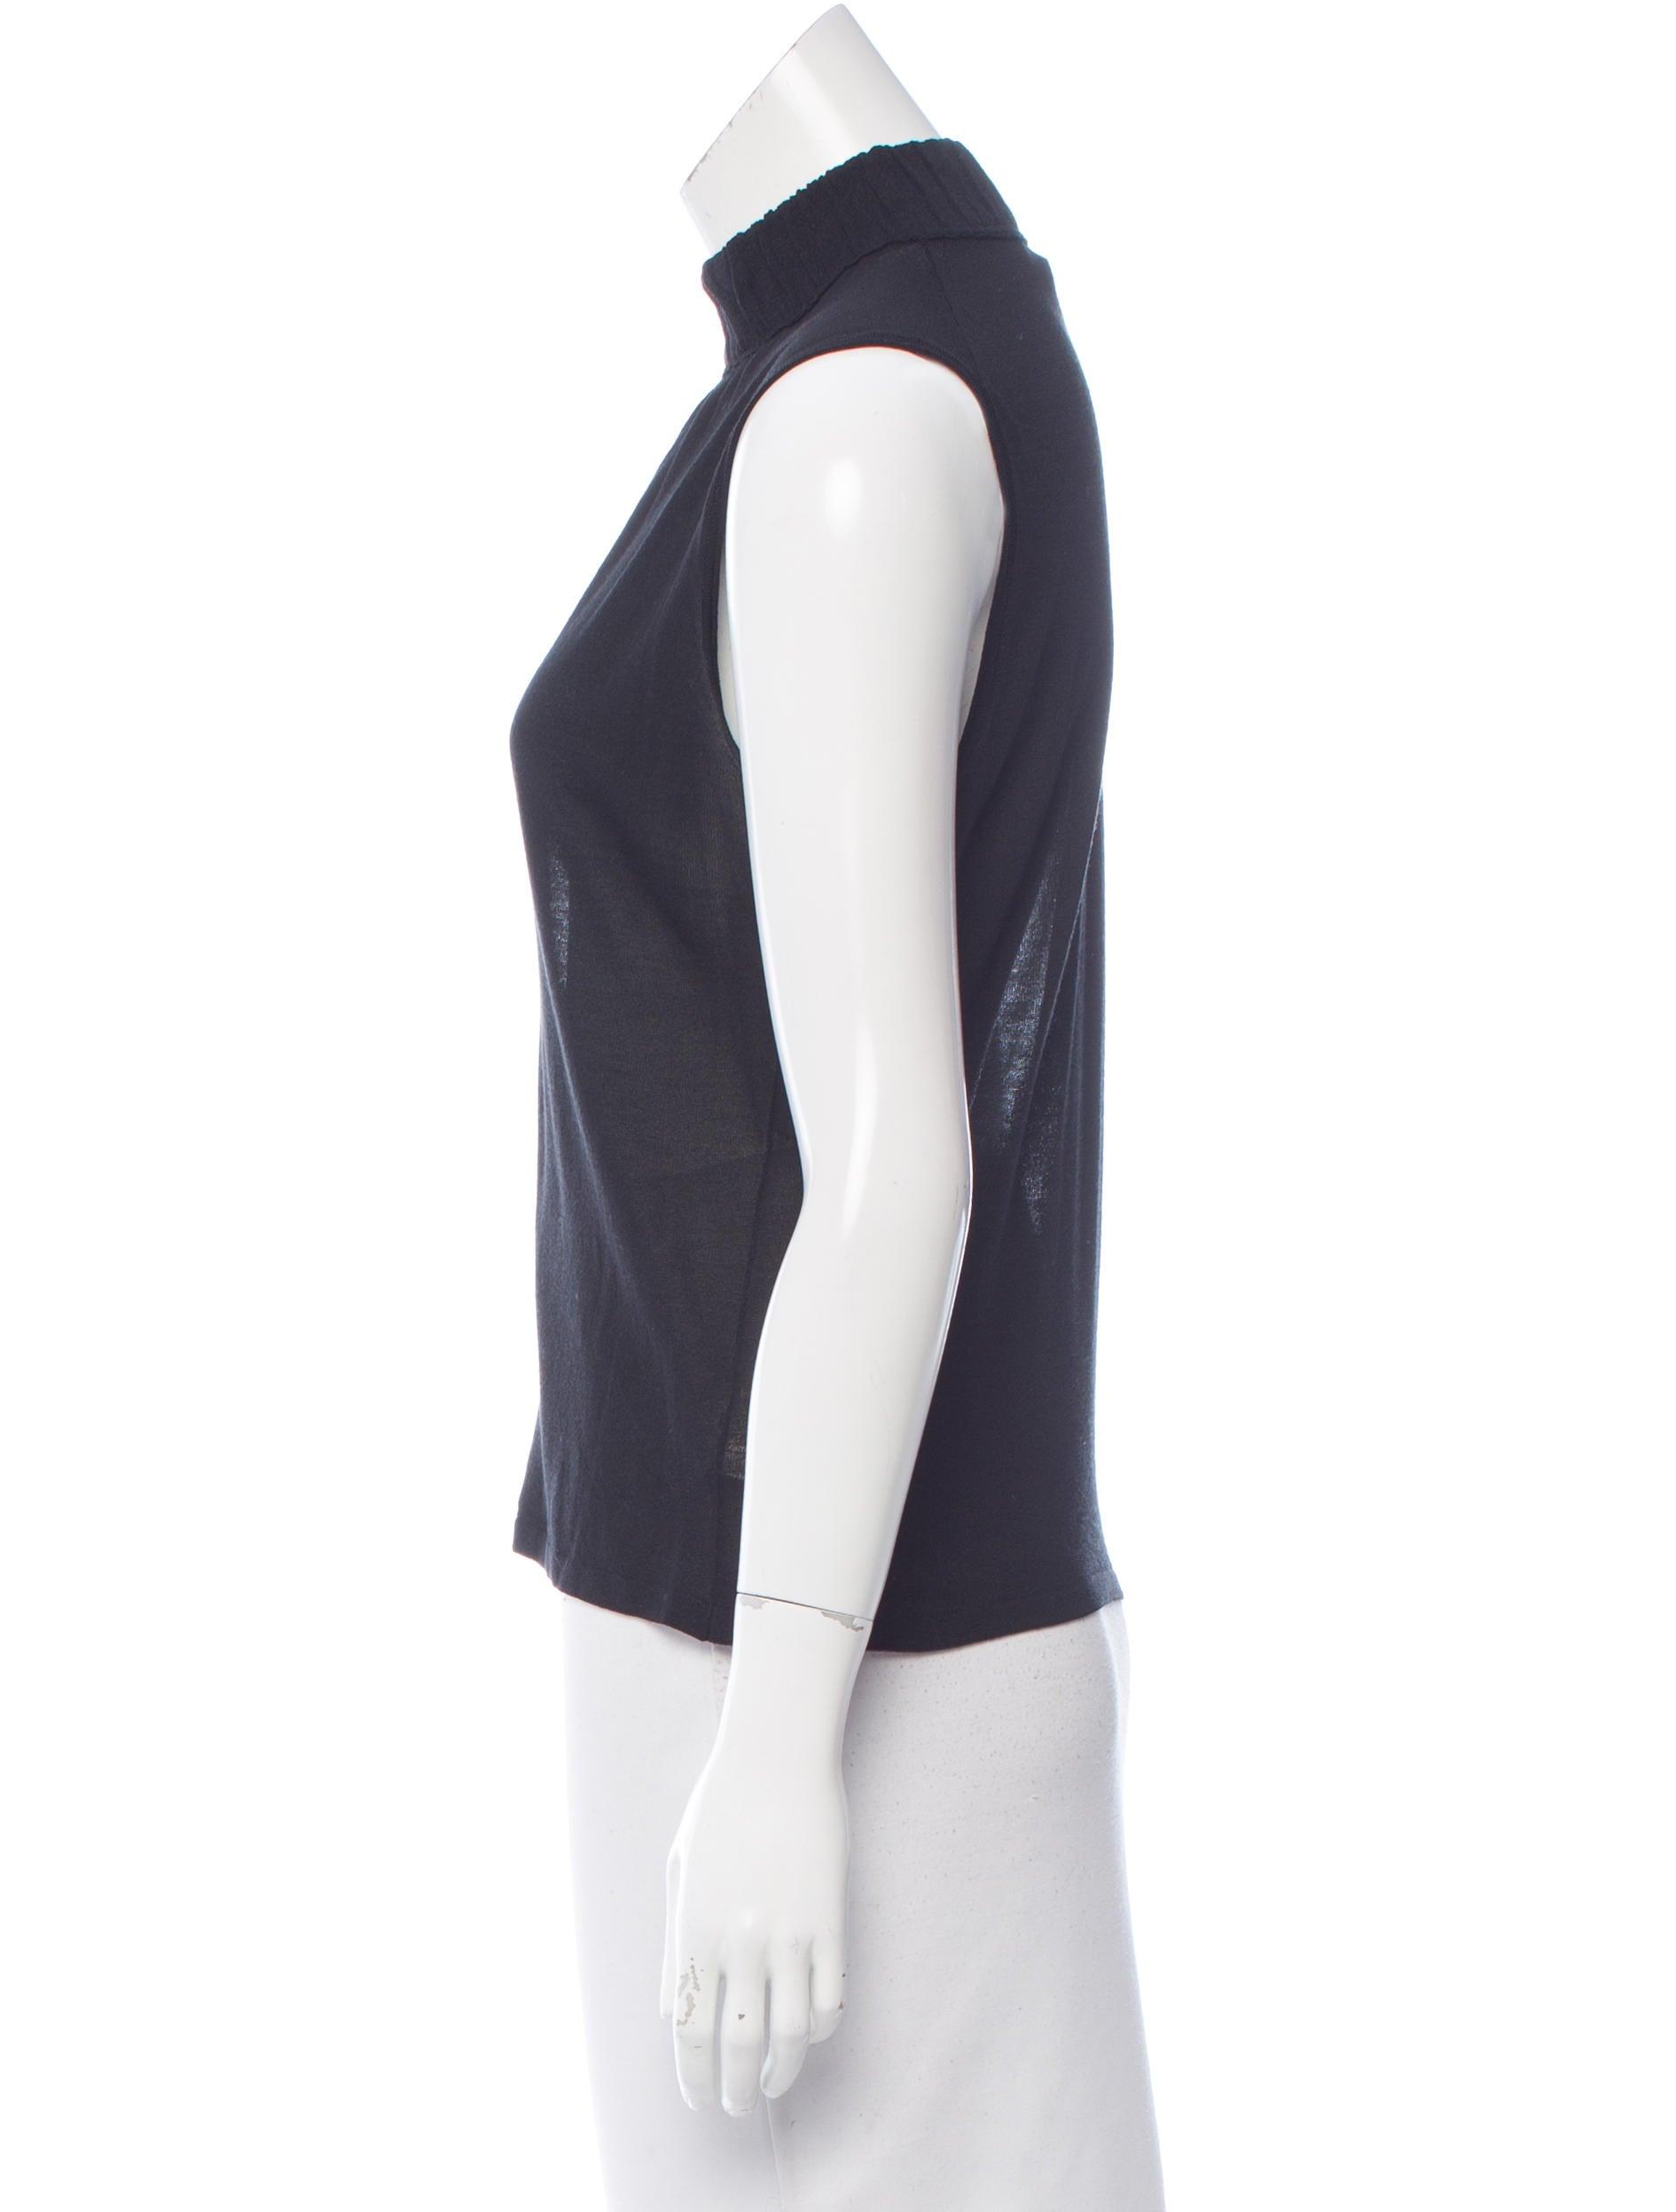 Gucci Sleeveless Mock Neck Top Clothing Guc151691